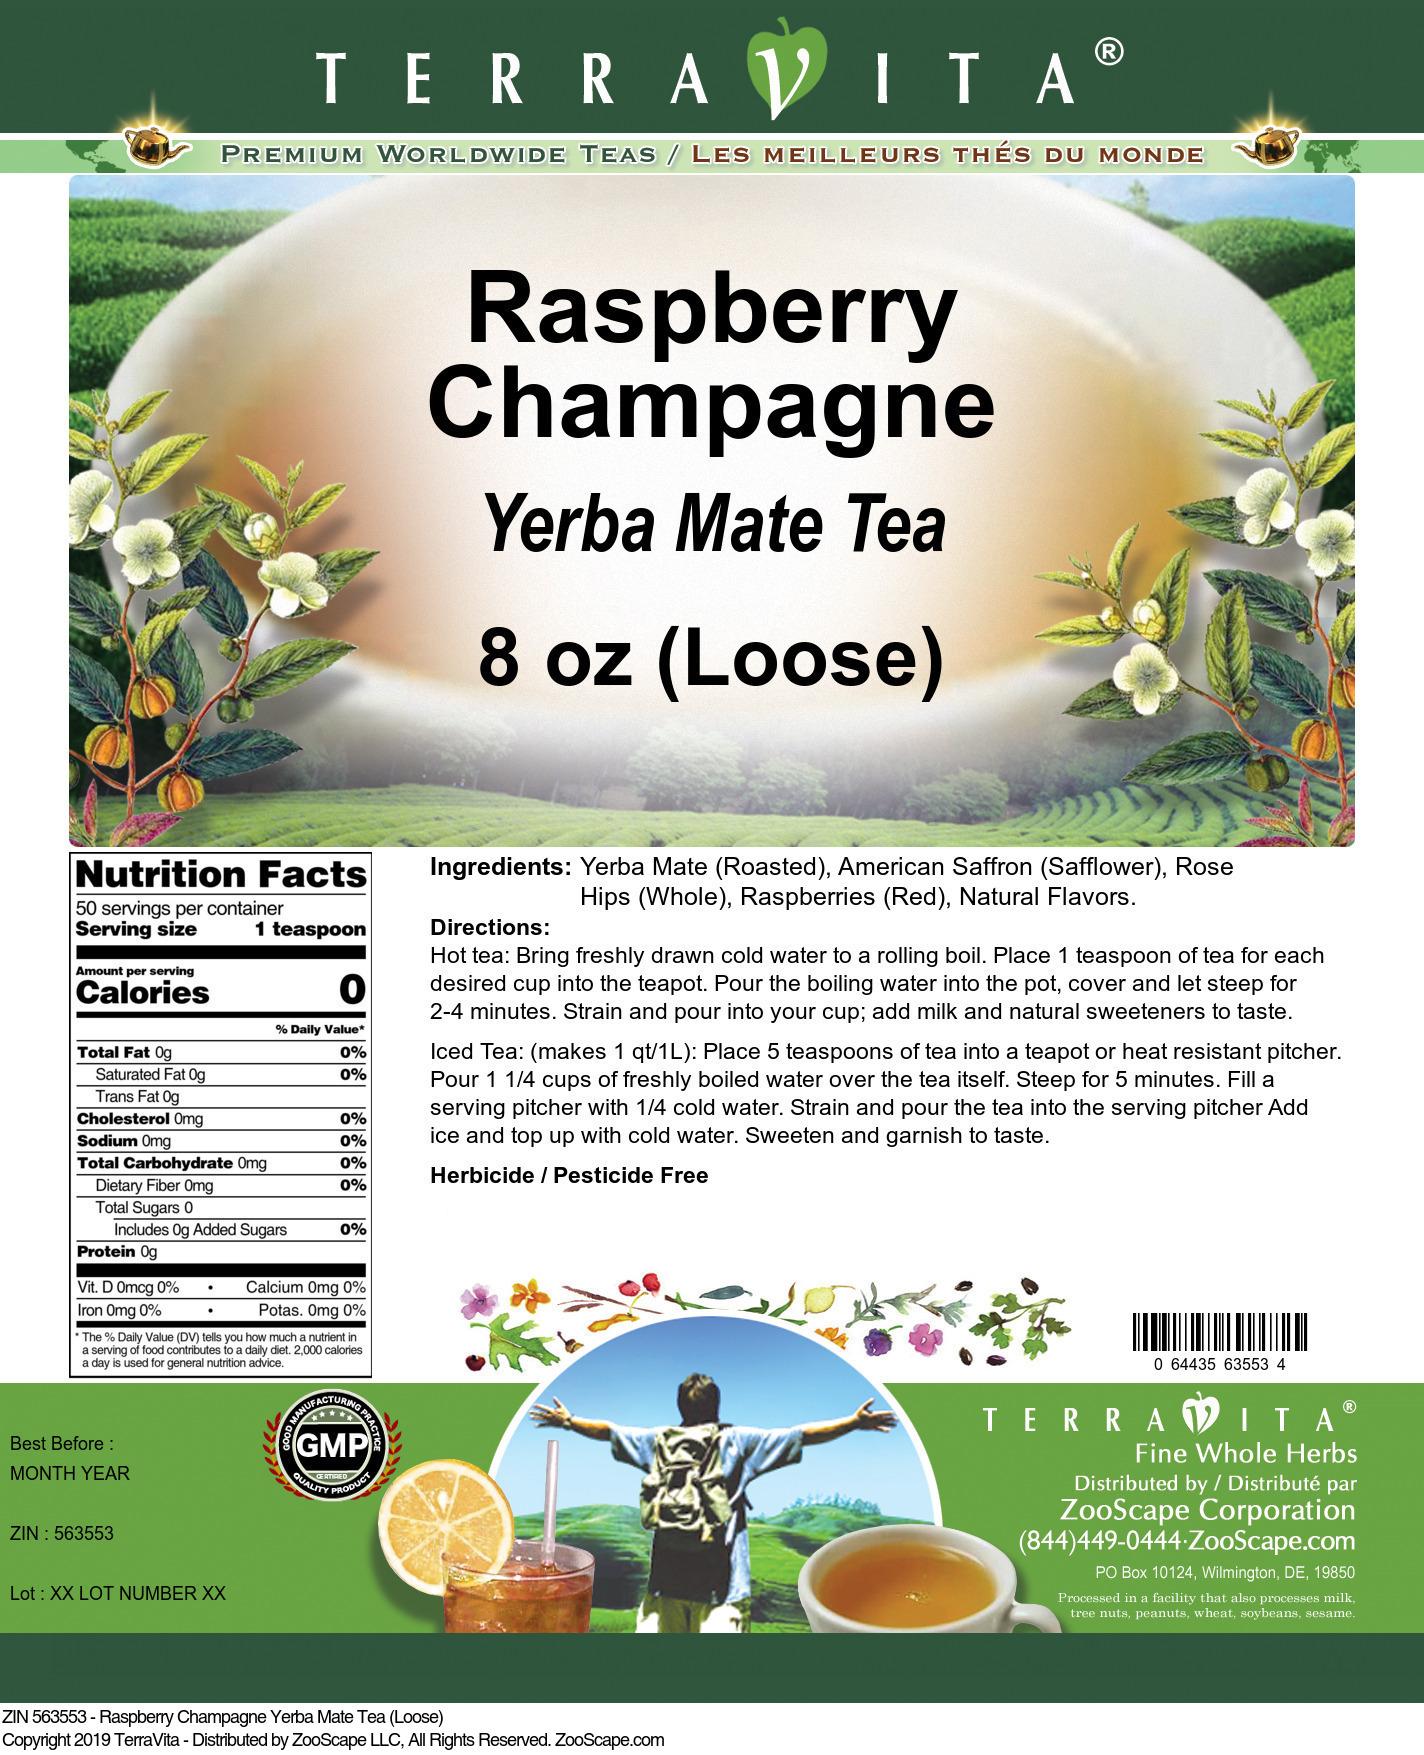 Raspberry Champagne Yerba Mate Tea (Loose)